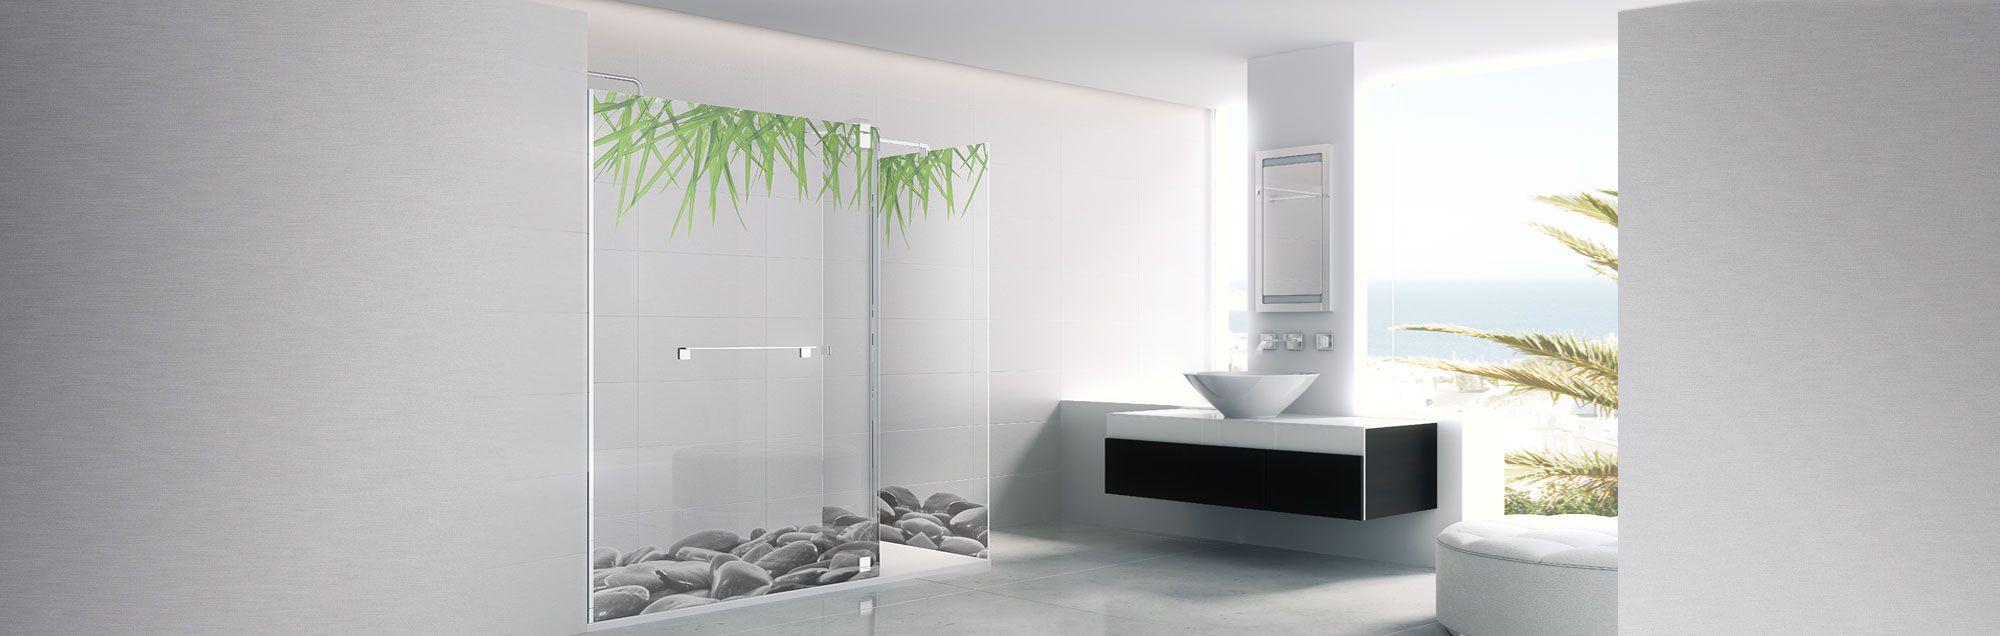 Serie Belus di box doccia walk-in su misura